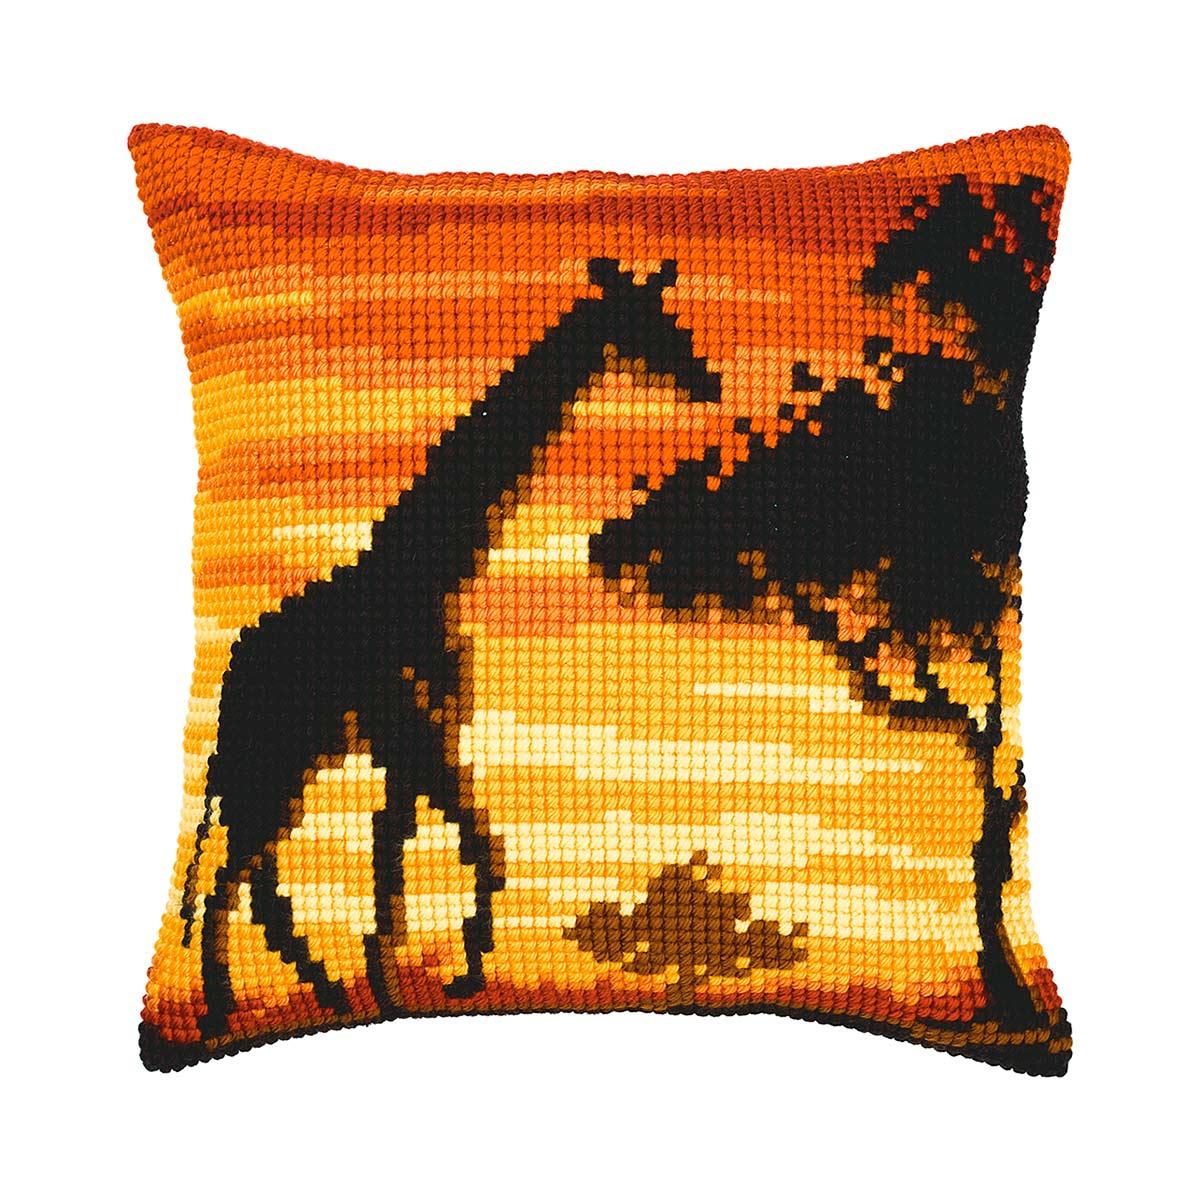 PN-0008642 Набор для вышивания подушки Vervaco 'Жираф' 40x40см